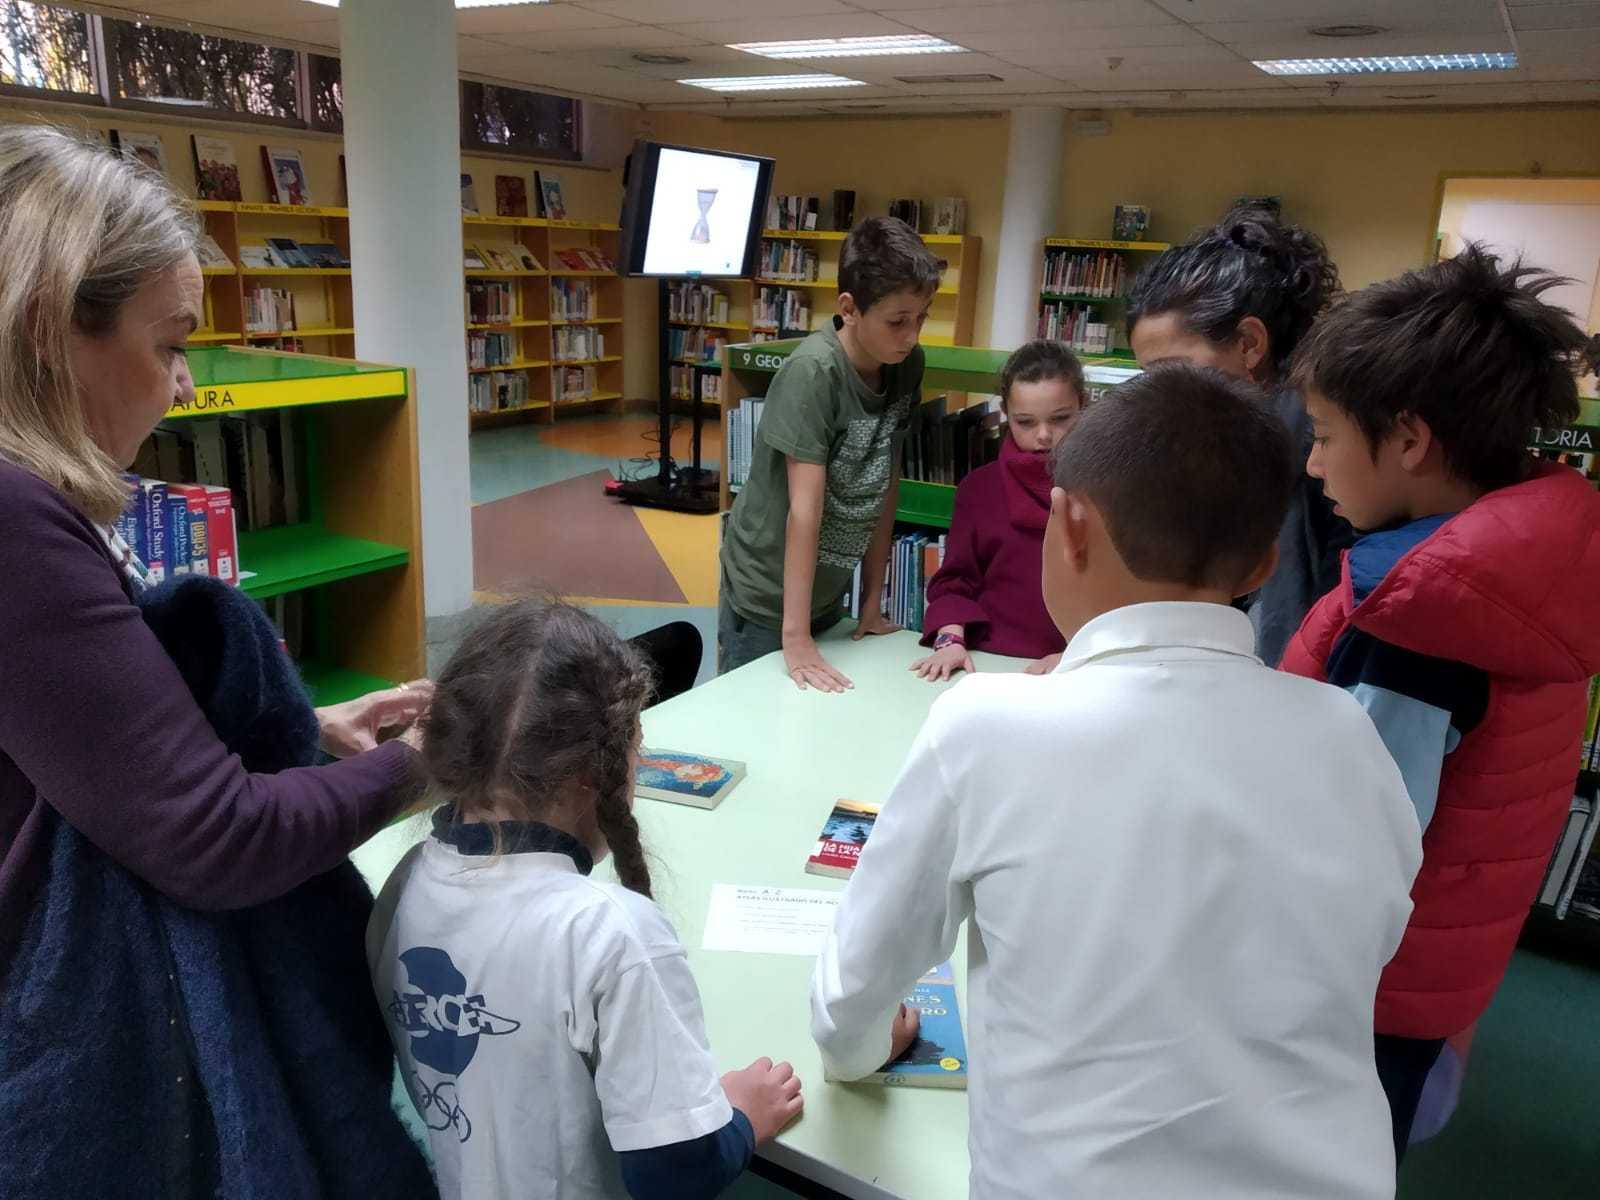 2019_04_04_Quinto visita la Biblioteca de Las Rozas_CEIP FDLR_Las Rozas